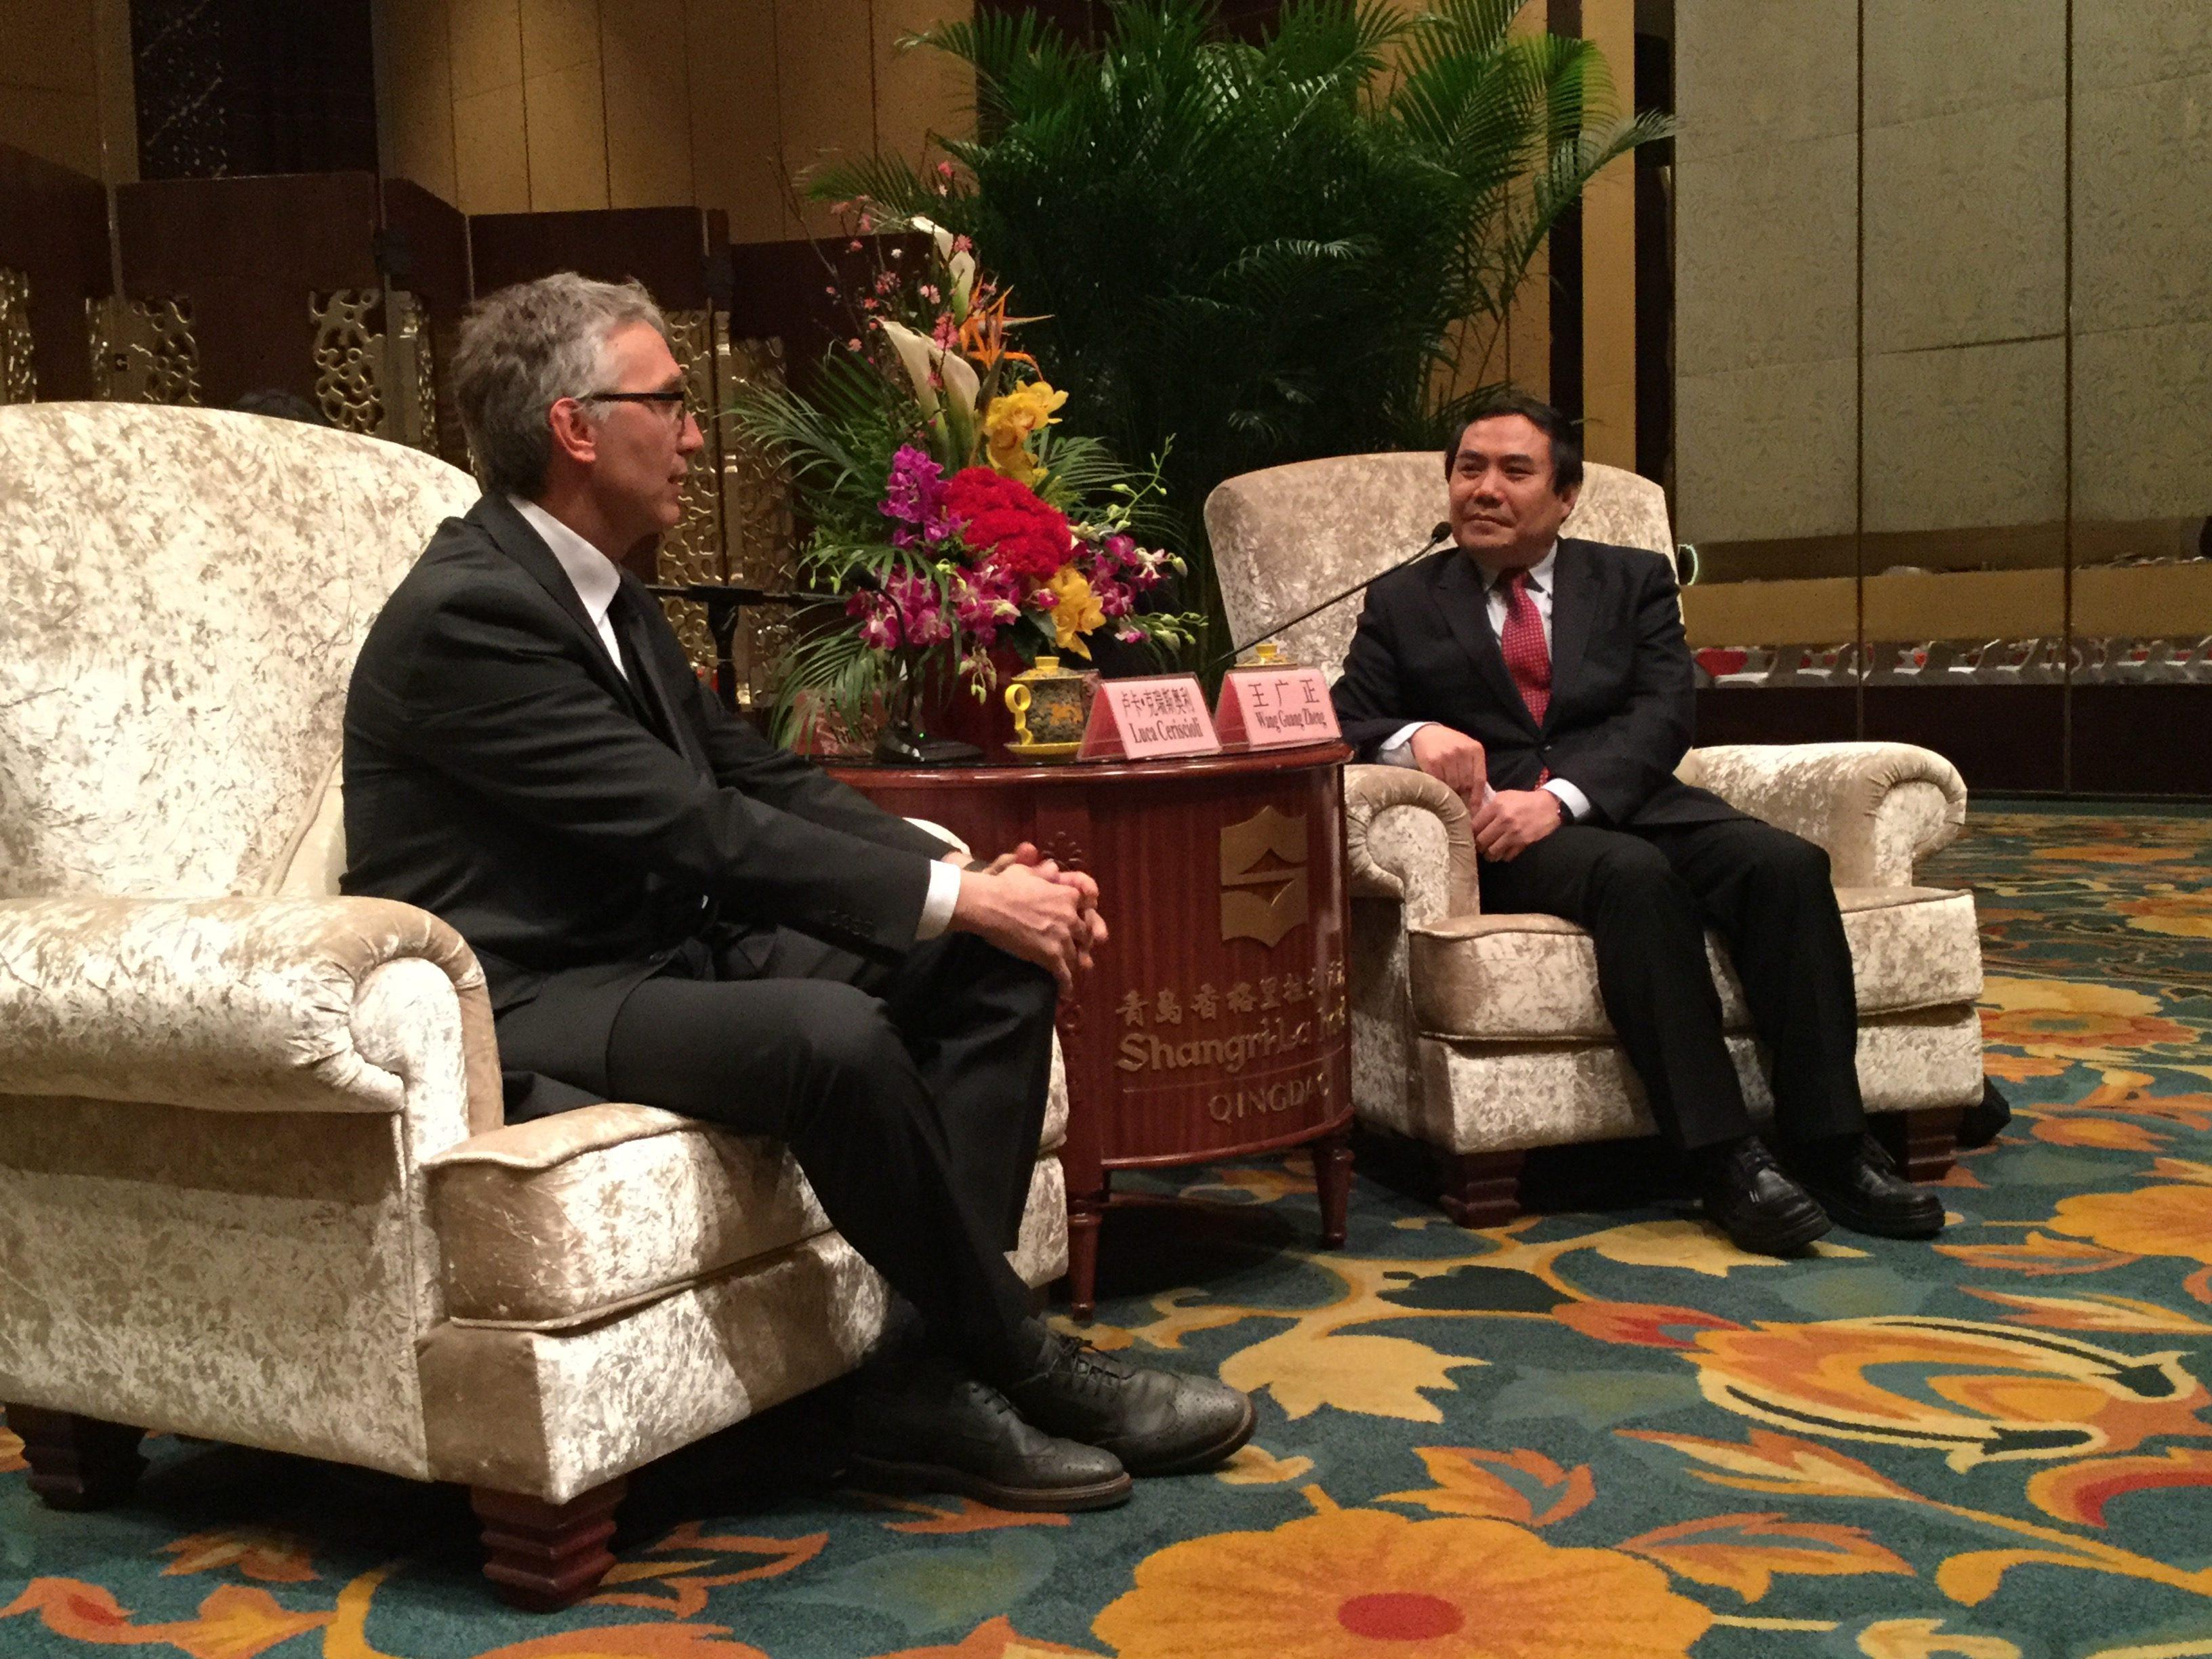 ceriscioli e il sindaco Qingdao Wang